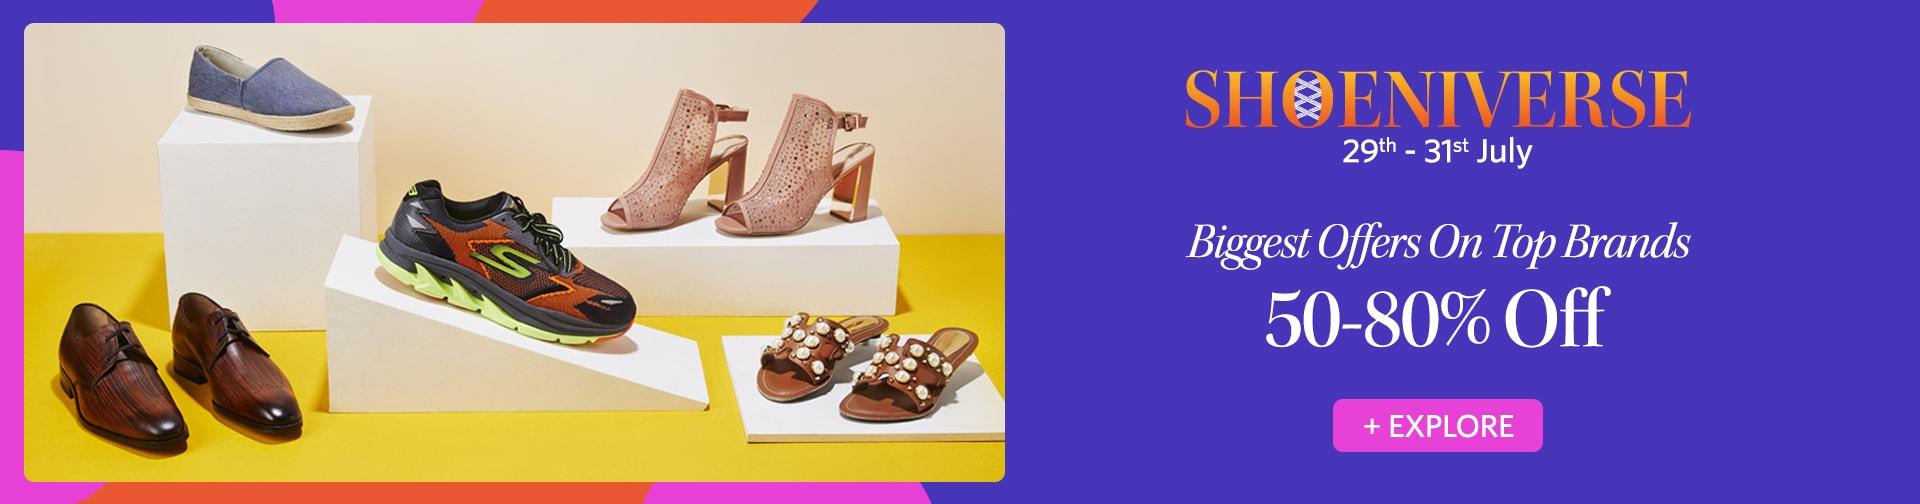 myntra.com - SHOENIVERSE – Get Up to 80% OFF on Footwear